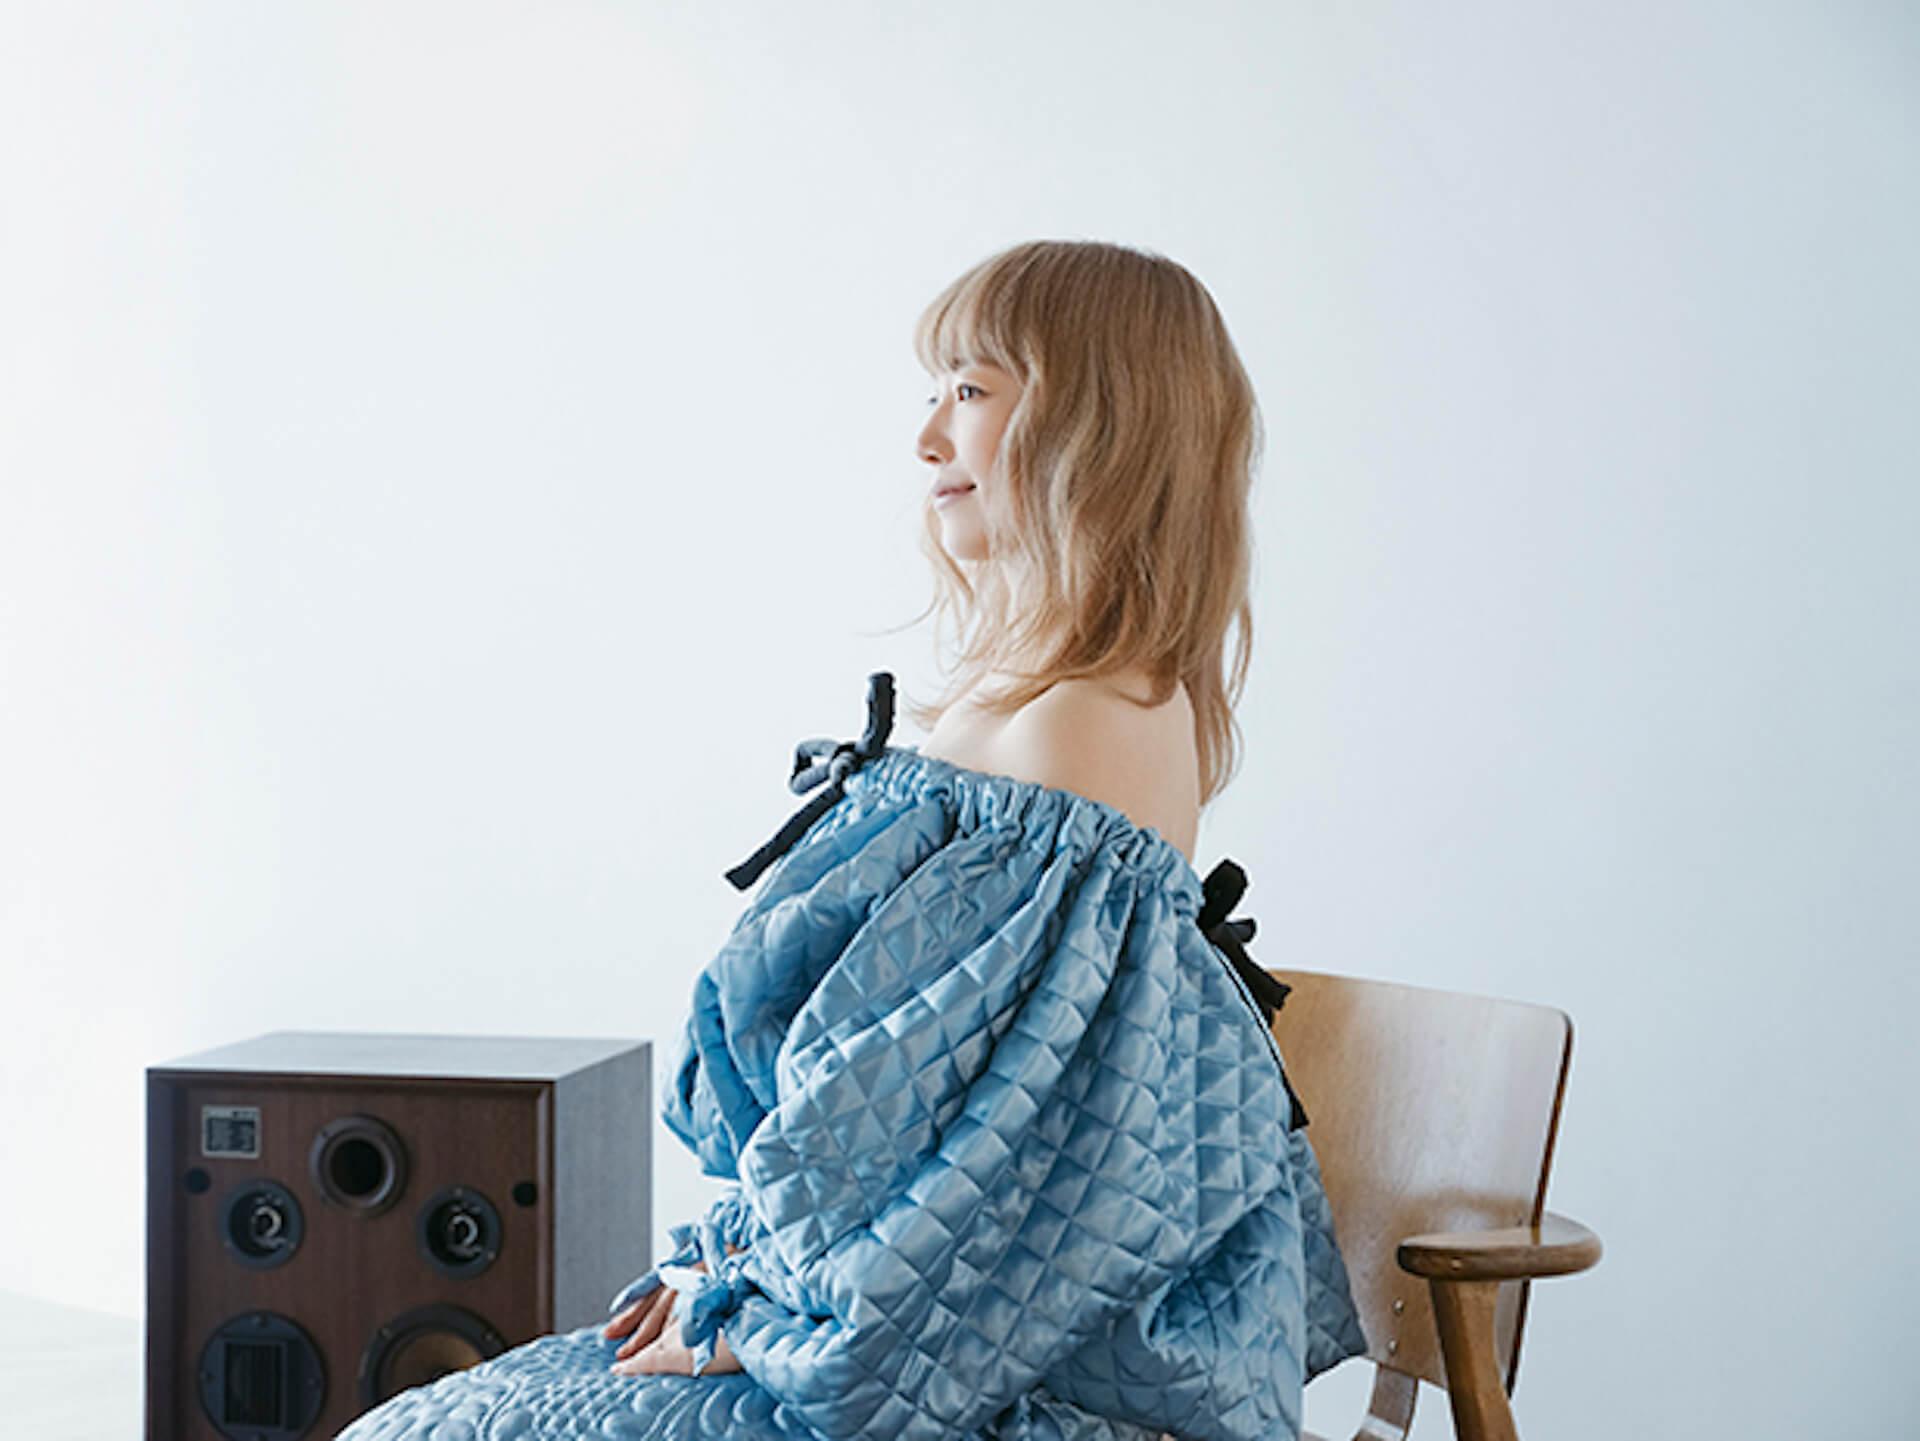 "YUKIのニューアルバム『Terminal』収録""My lovely ghost""のMVティザー映像が解禁!ラジオ出演も決定 music210415_yuki_3"